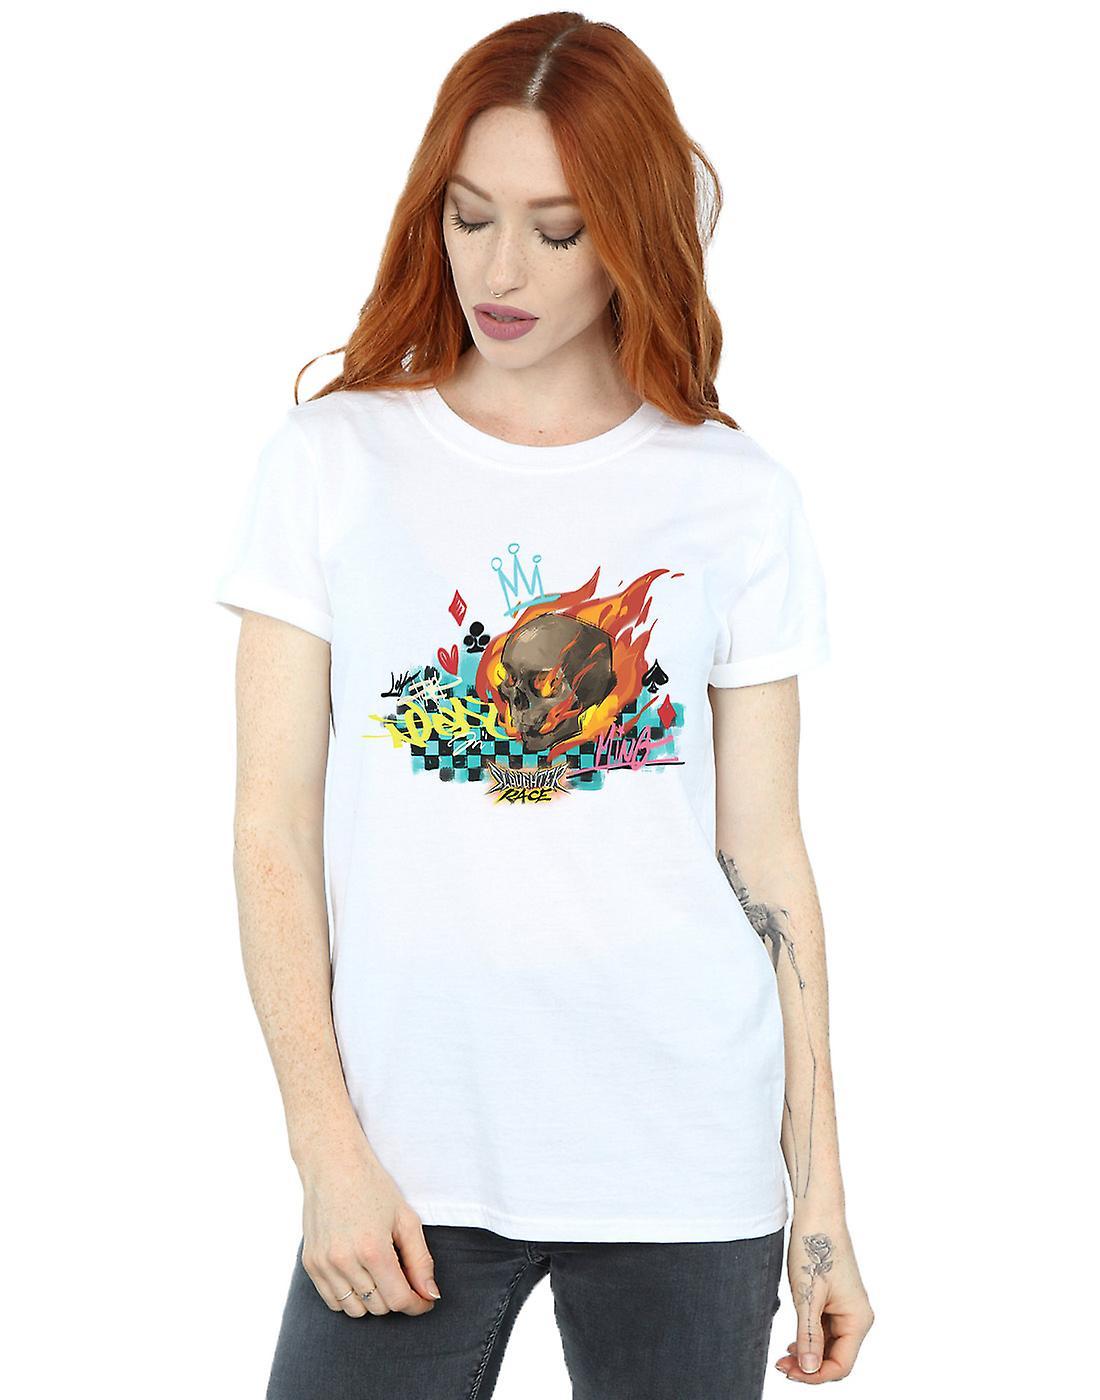 Disney Women's Wreck It Ralph Race Skull Boyfriend Fit T-Shirt